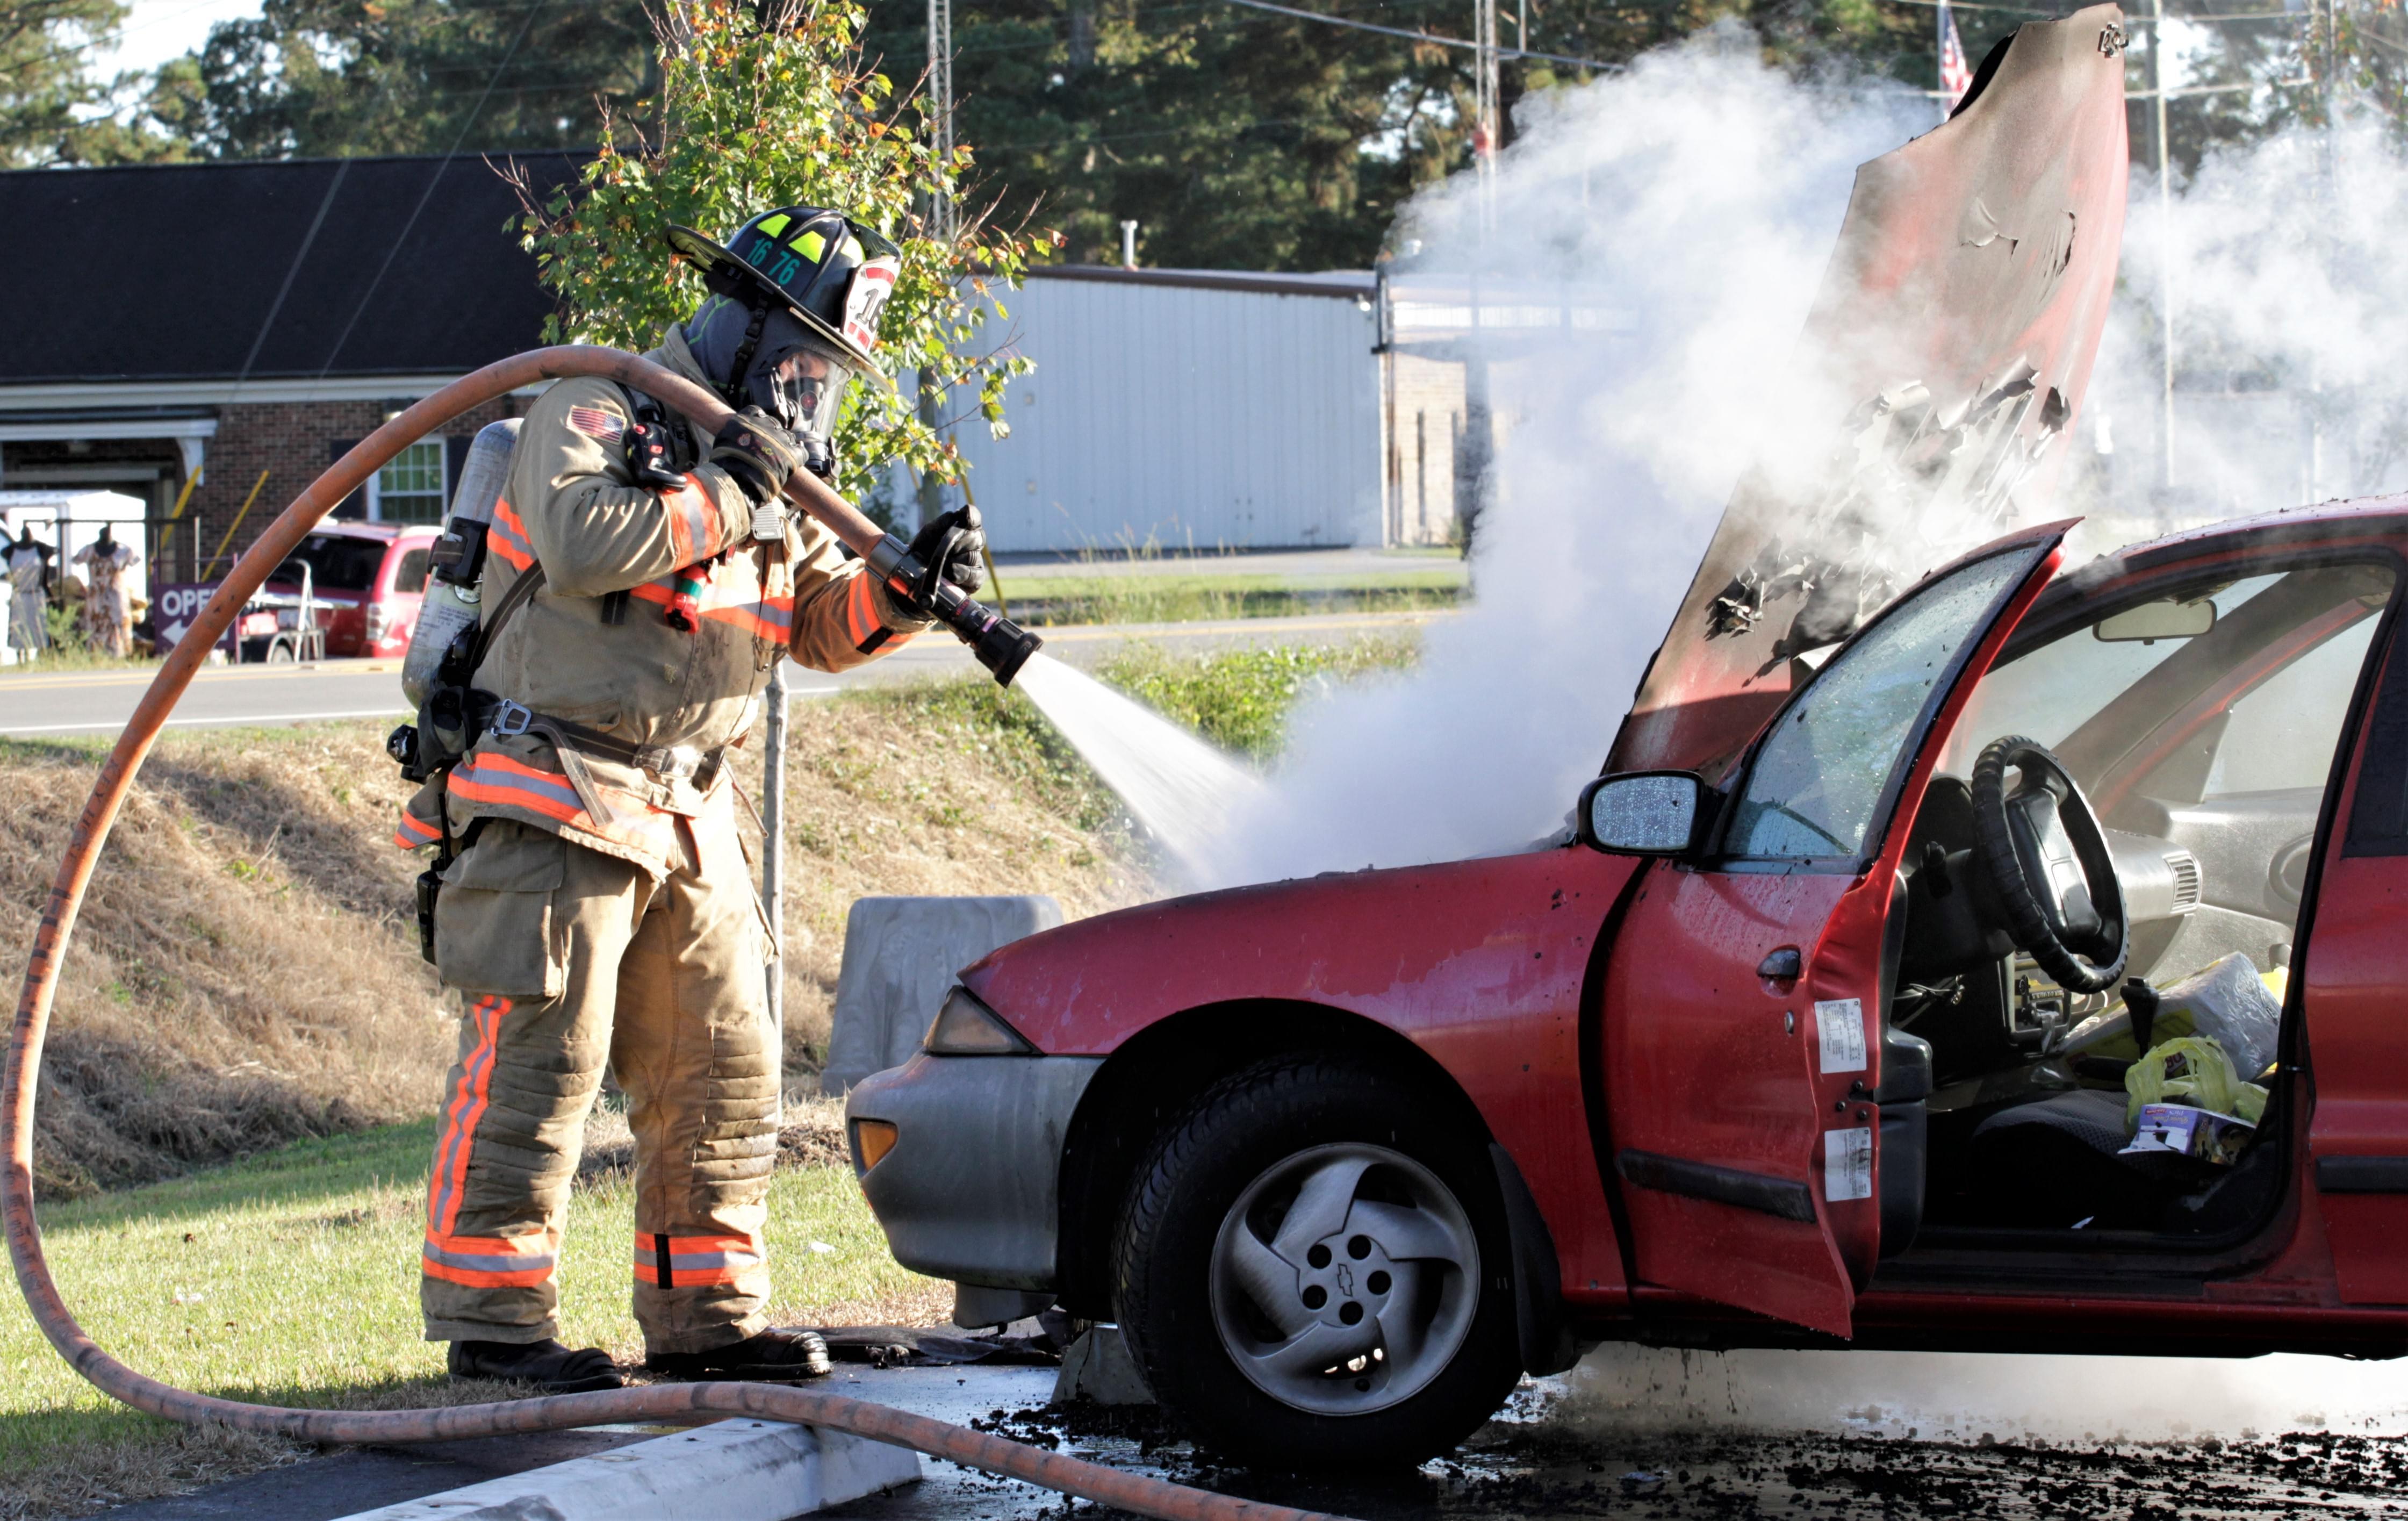 Firefighters Extinguish Vehicle Blaze (PHOTOS)